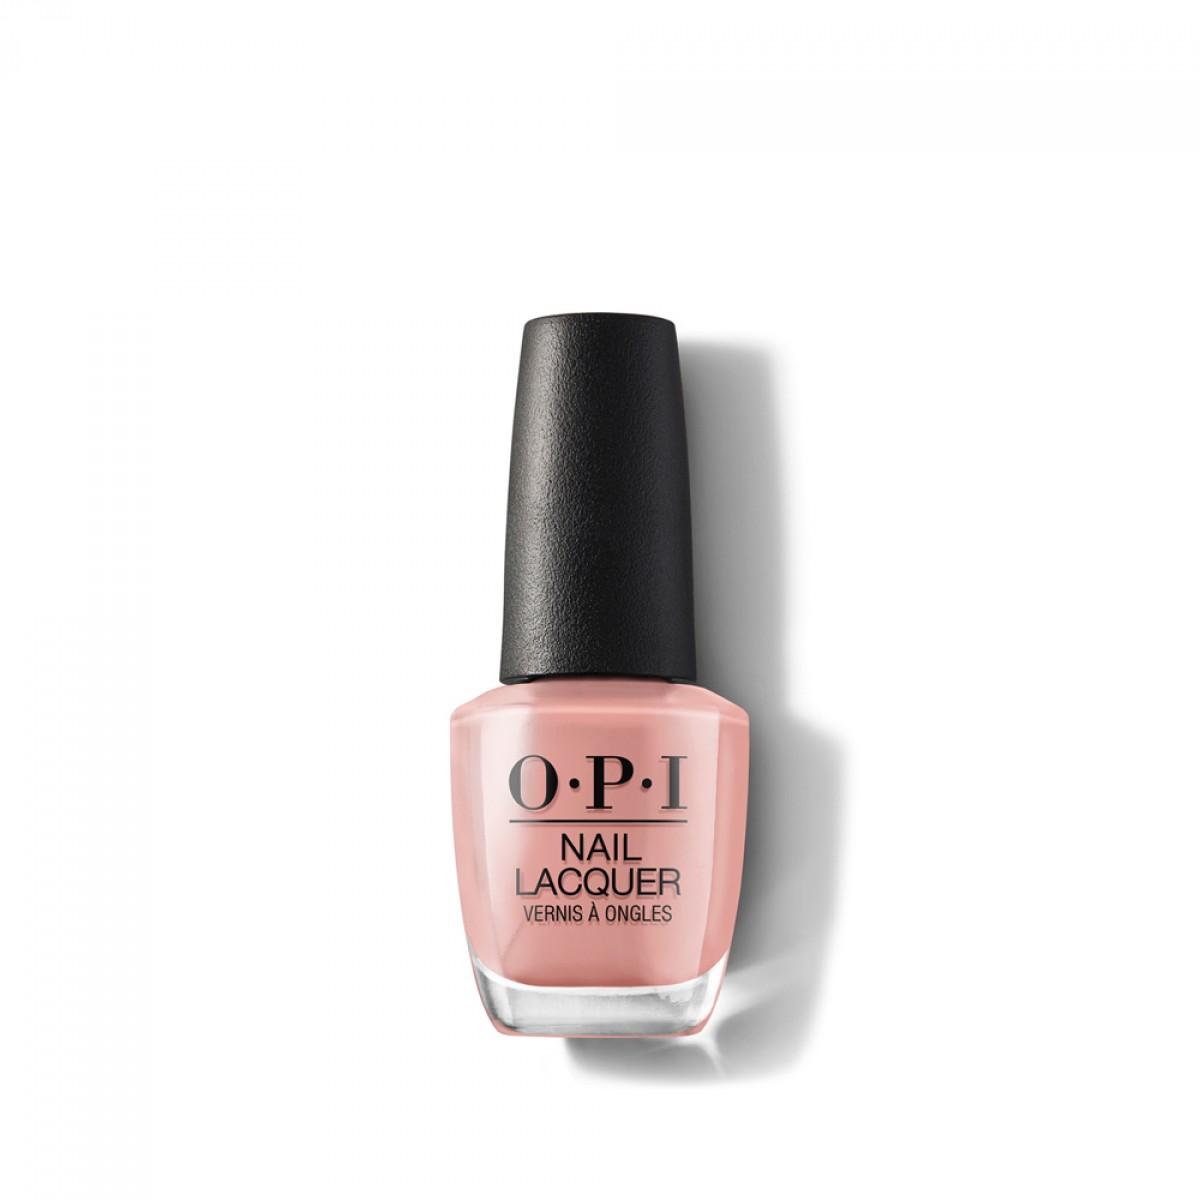 Opi Lisbon Collection Aelia Duty Free 10 Sleva Na Vasi Online Objednavku